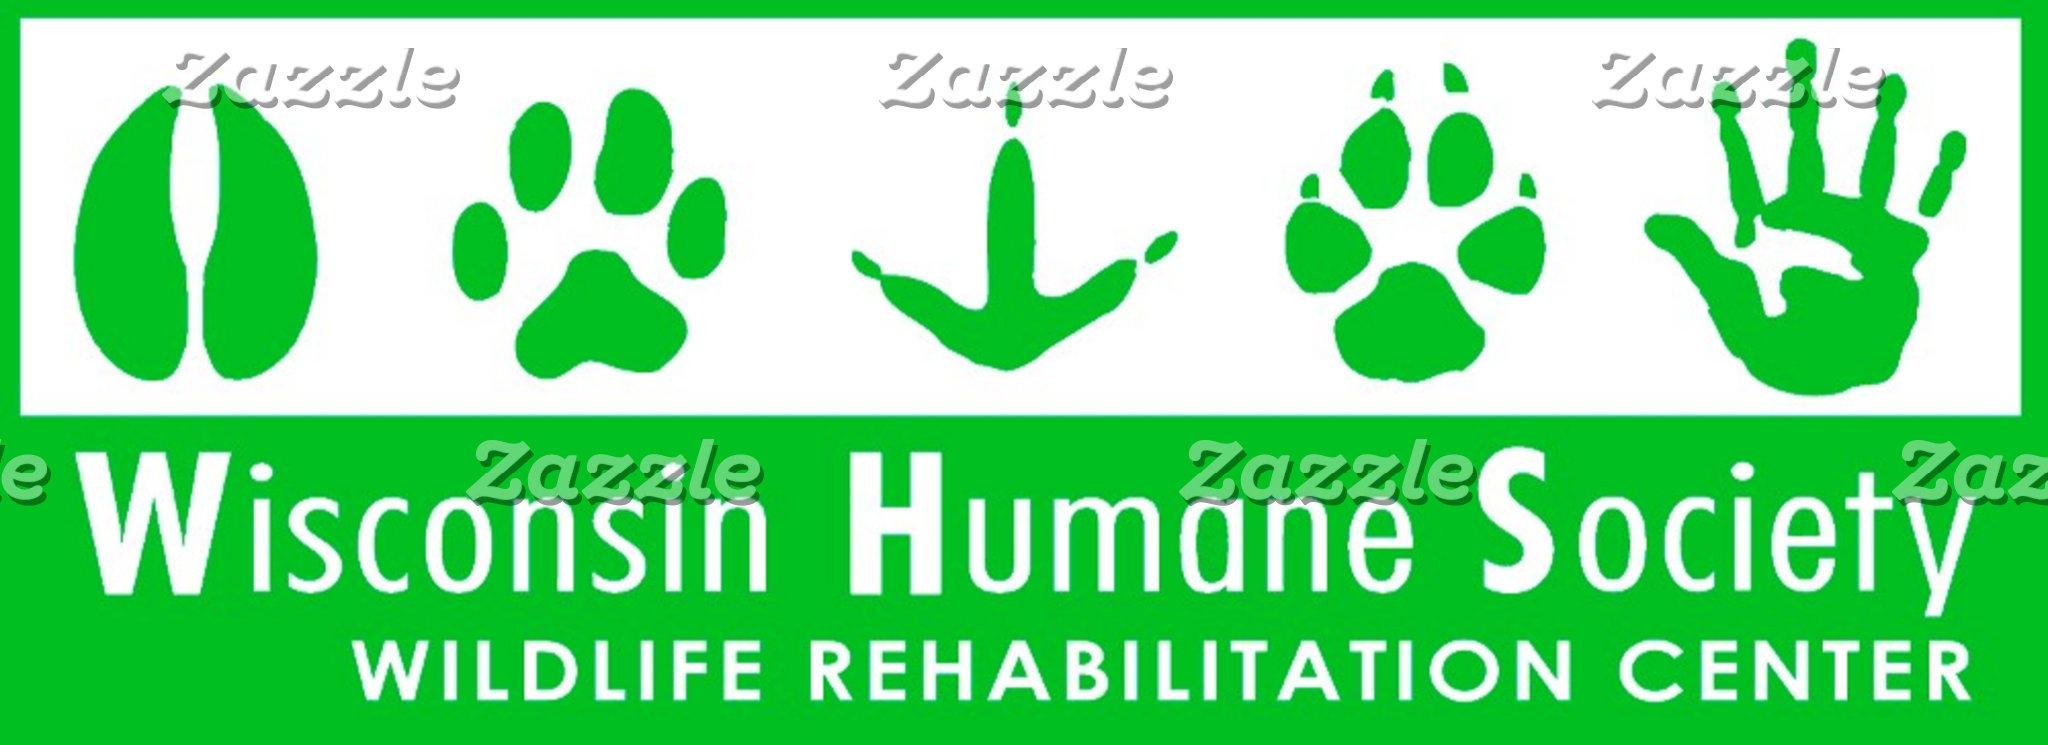 Wildlife Rehabilition Center Gear